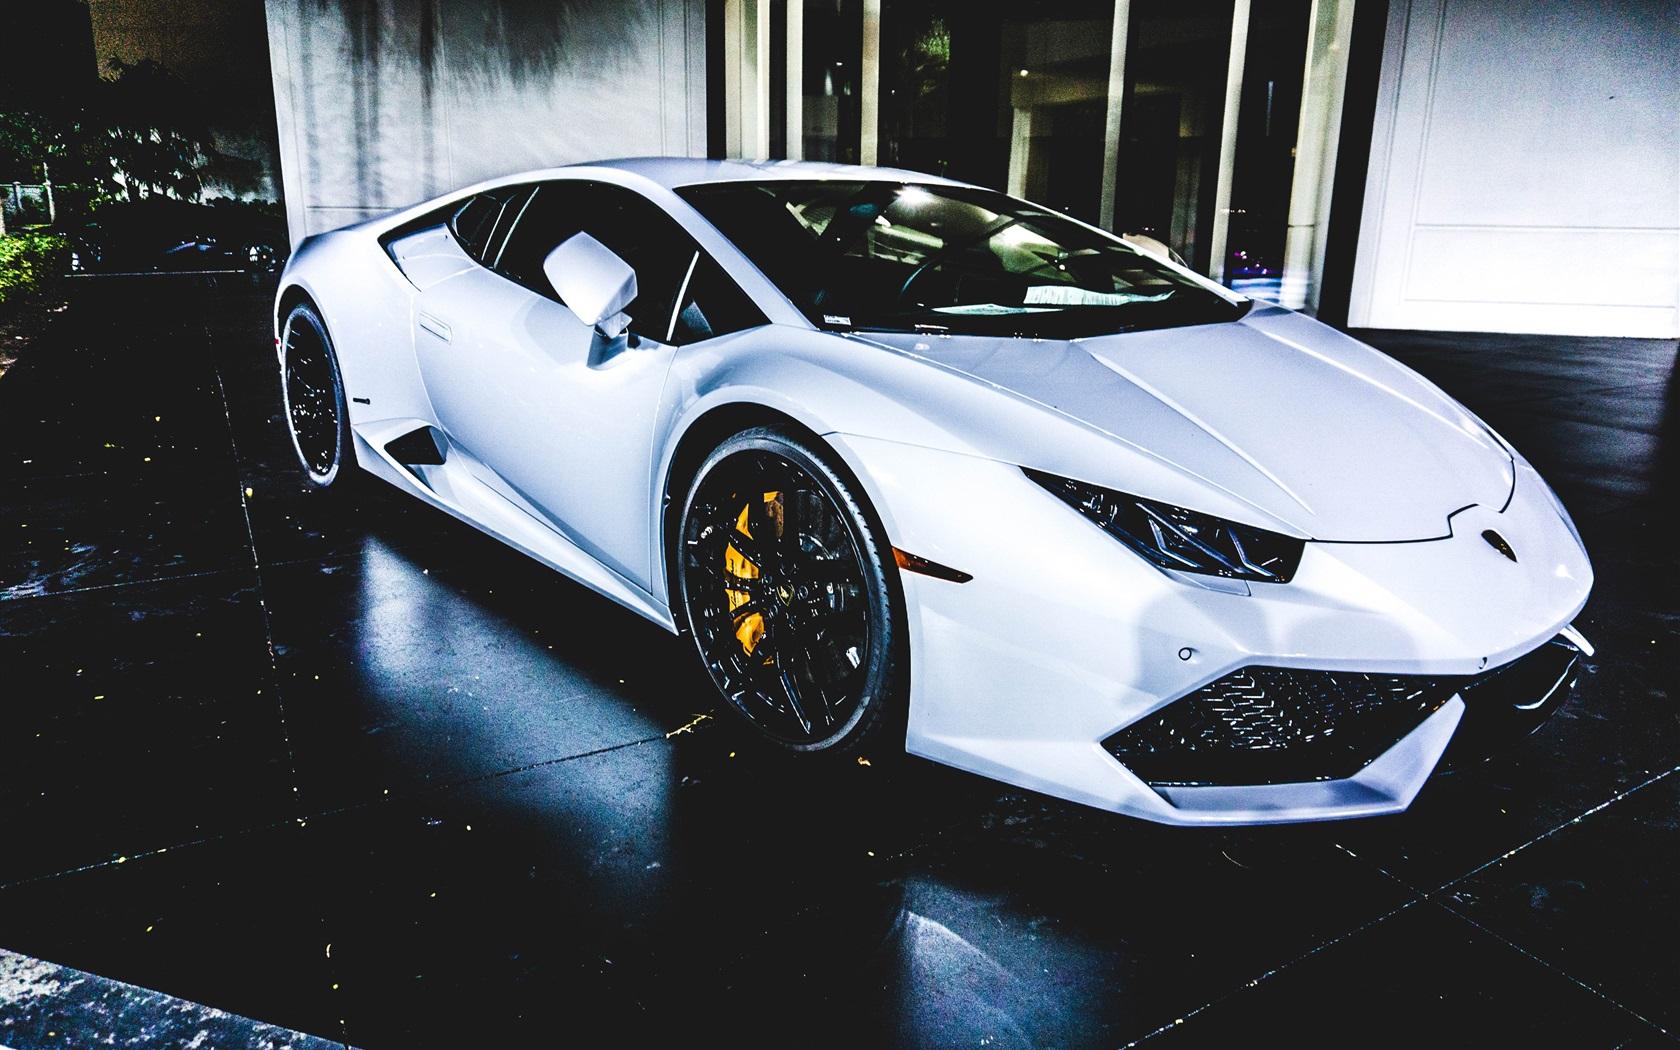 Fondos De Pantalla 4k Coches: Fondos De Pantalla Coche Deportivo Blanco Lamborghini